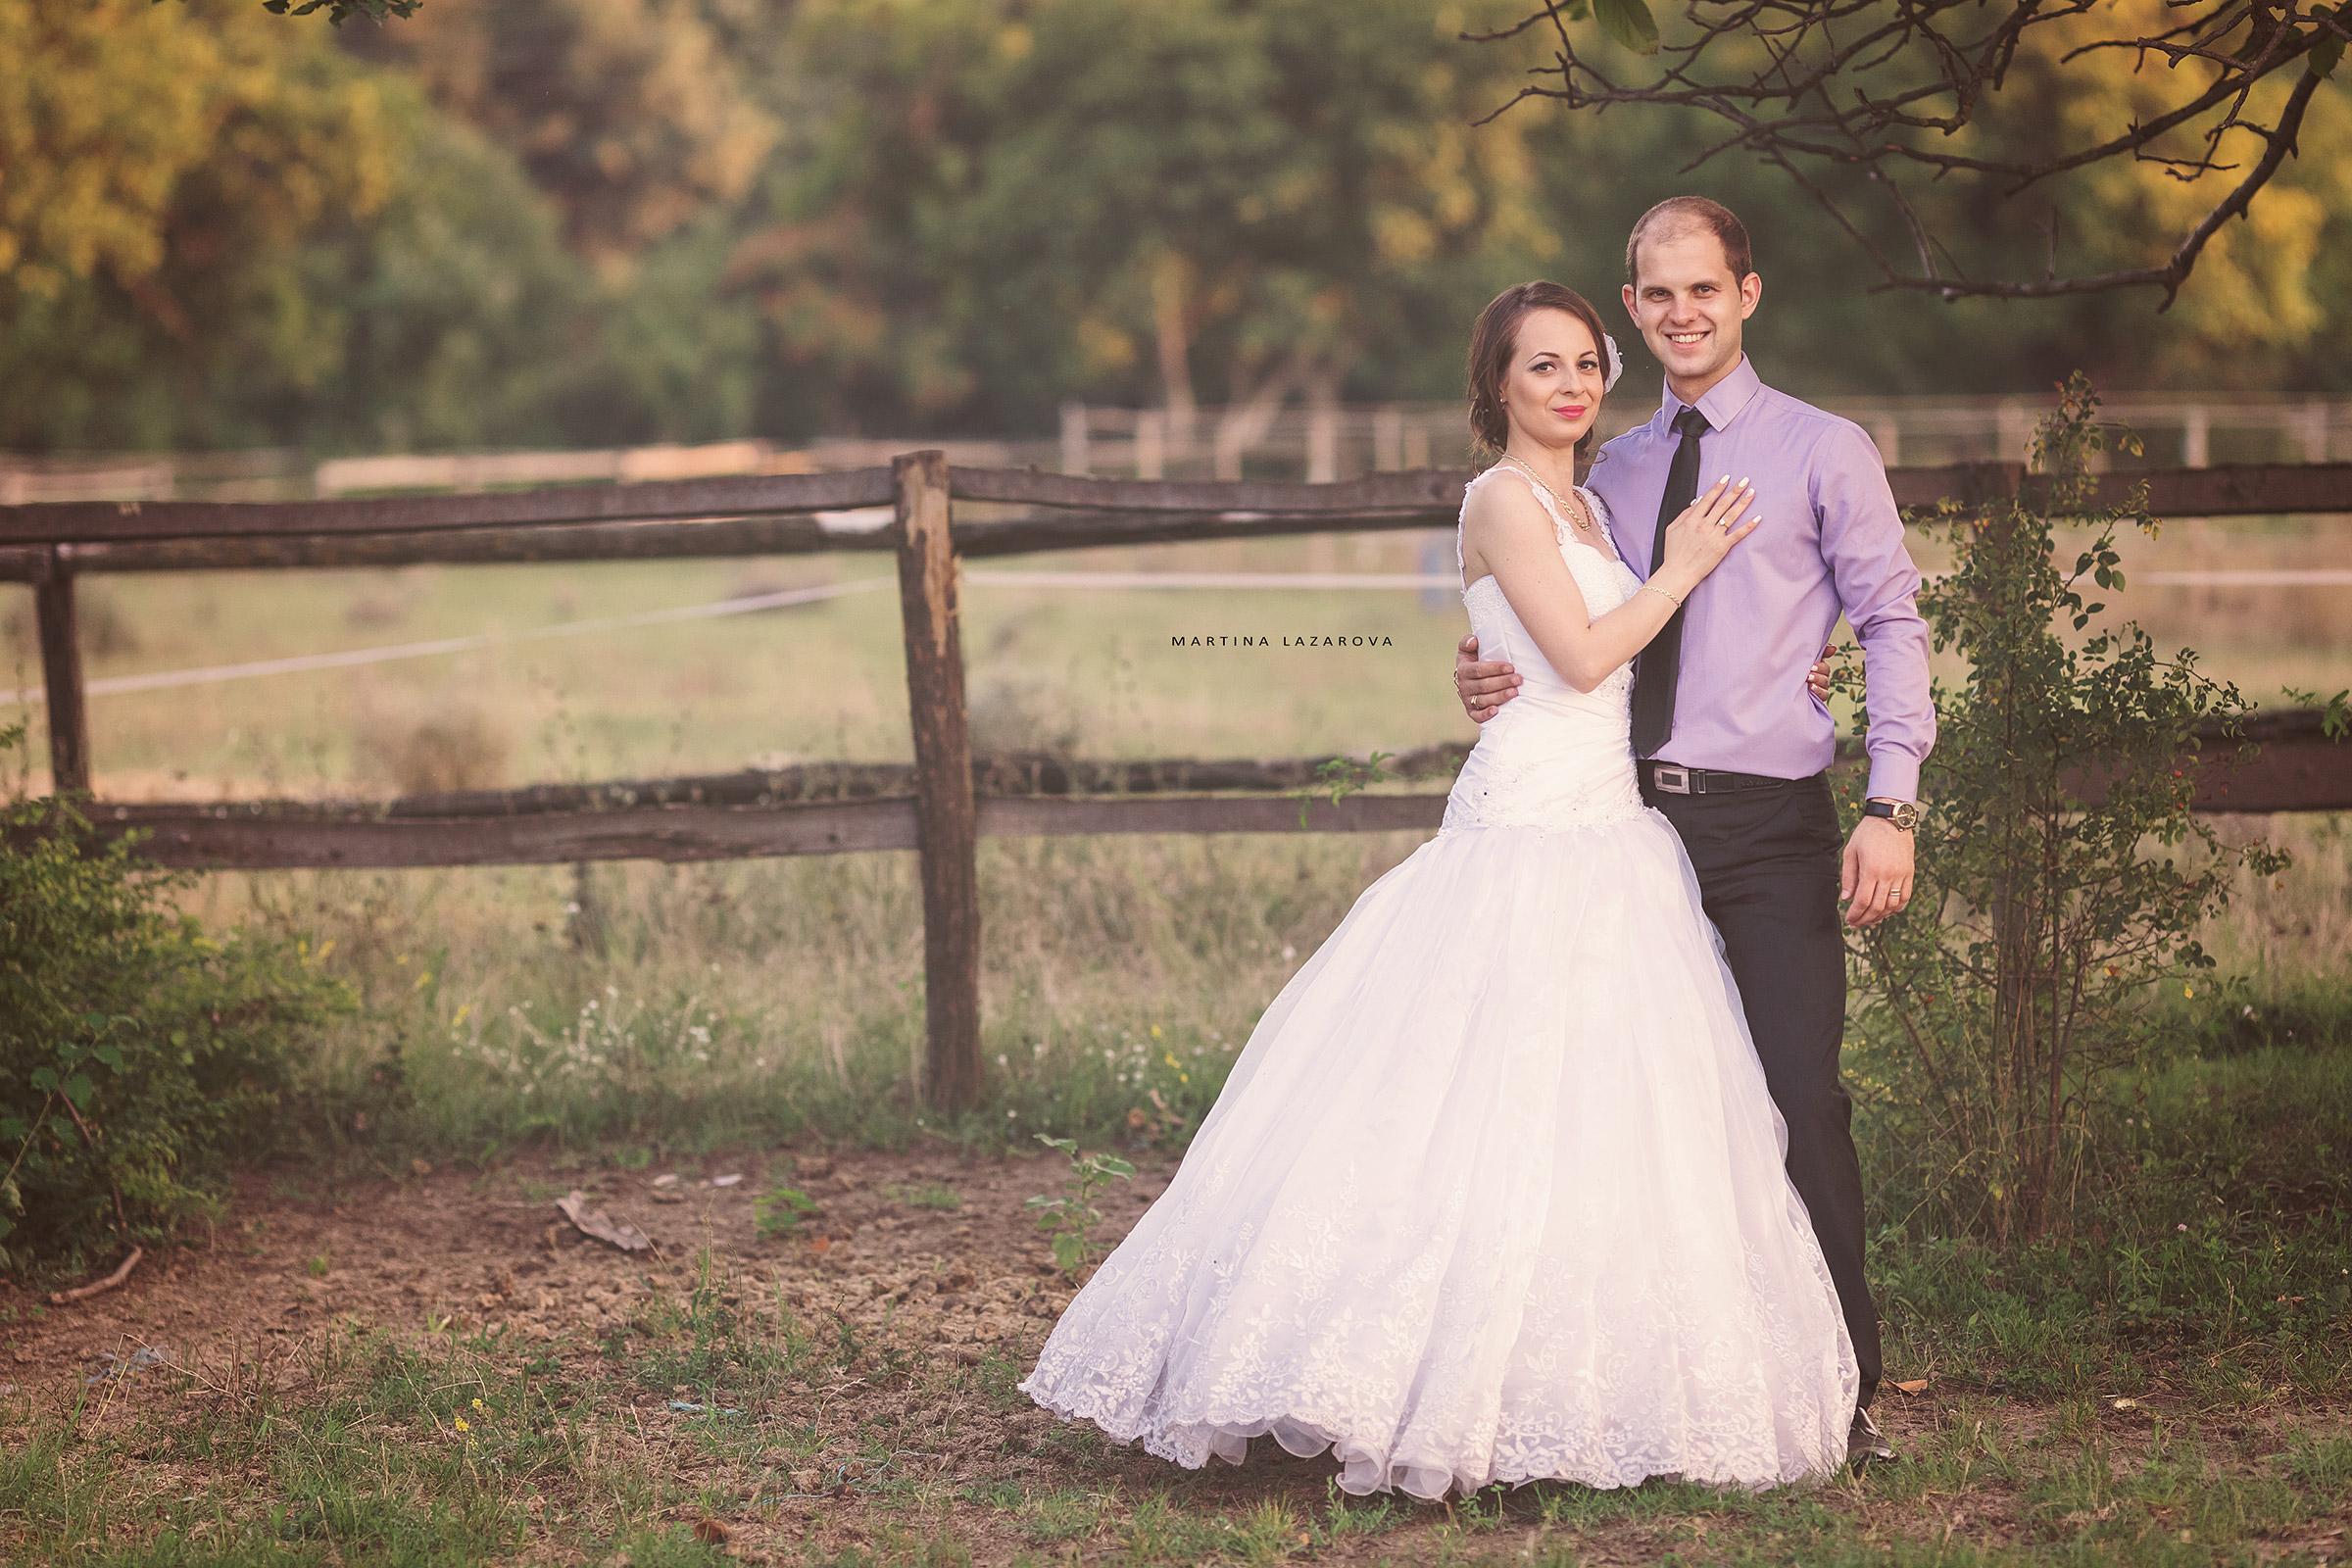 Wedding-PhotoShoot-A&S-74